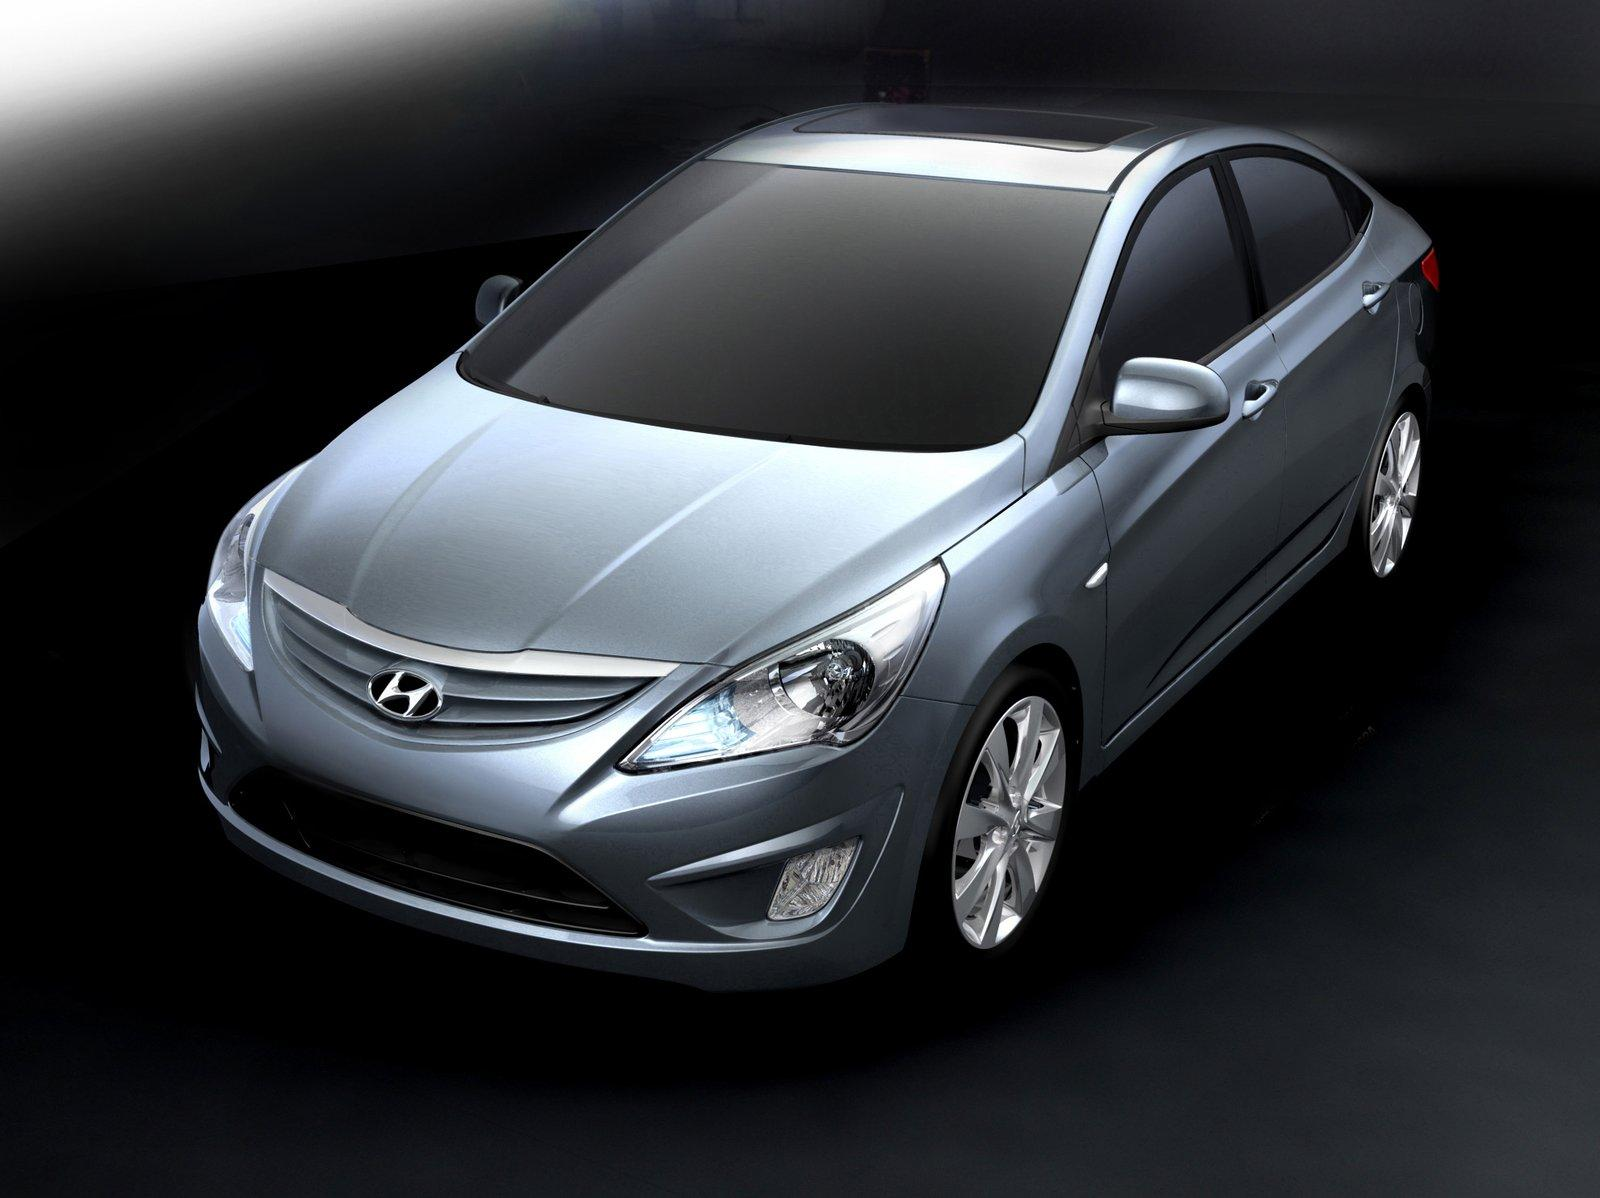 Hyundai Verna Rb Wallpapers